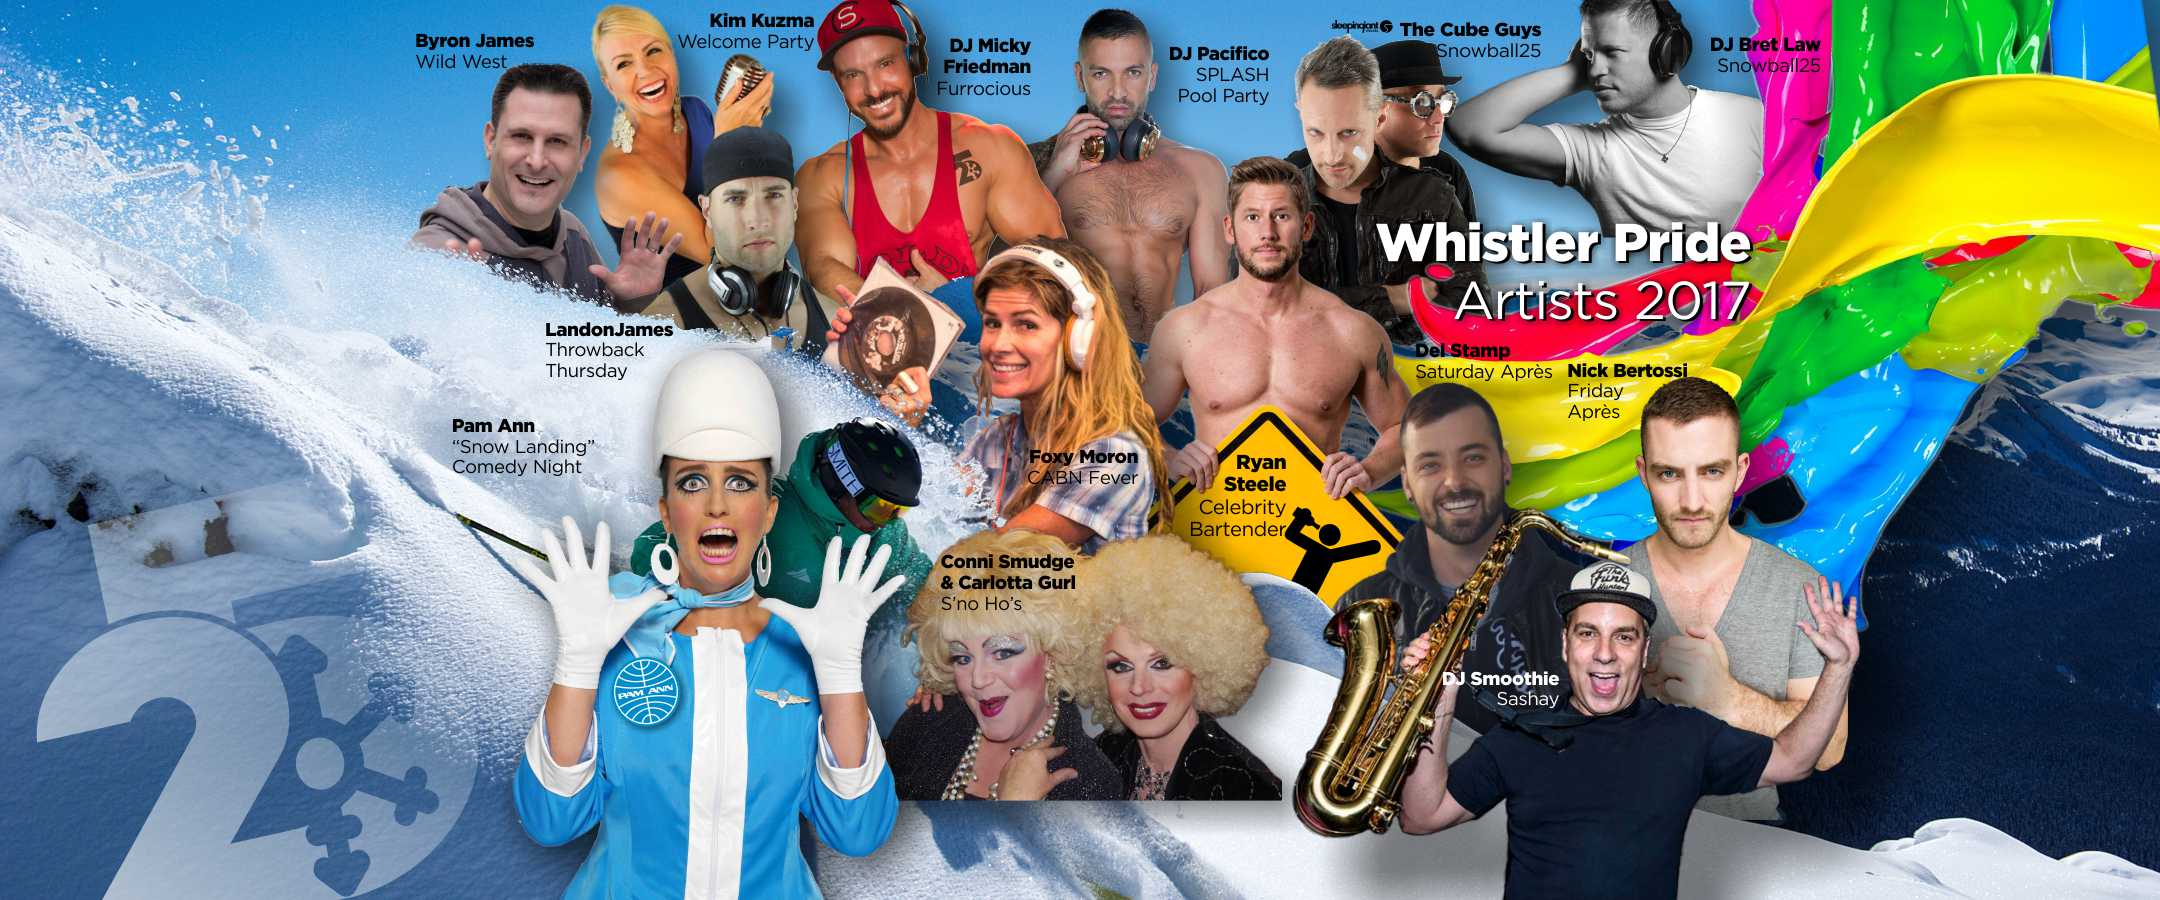 WhistlerPride25 Talent